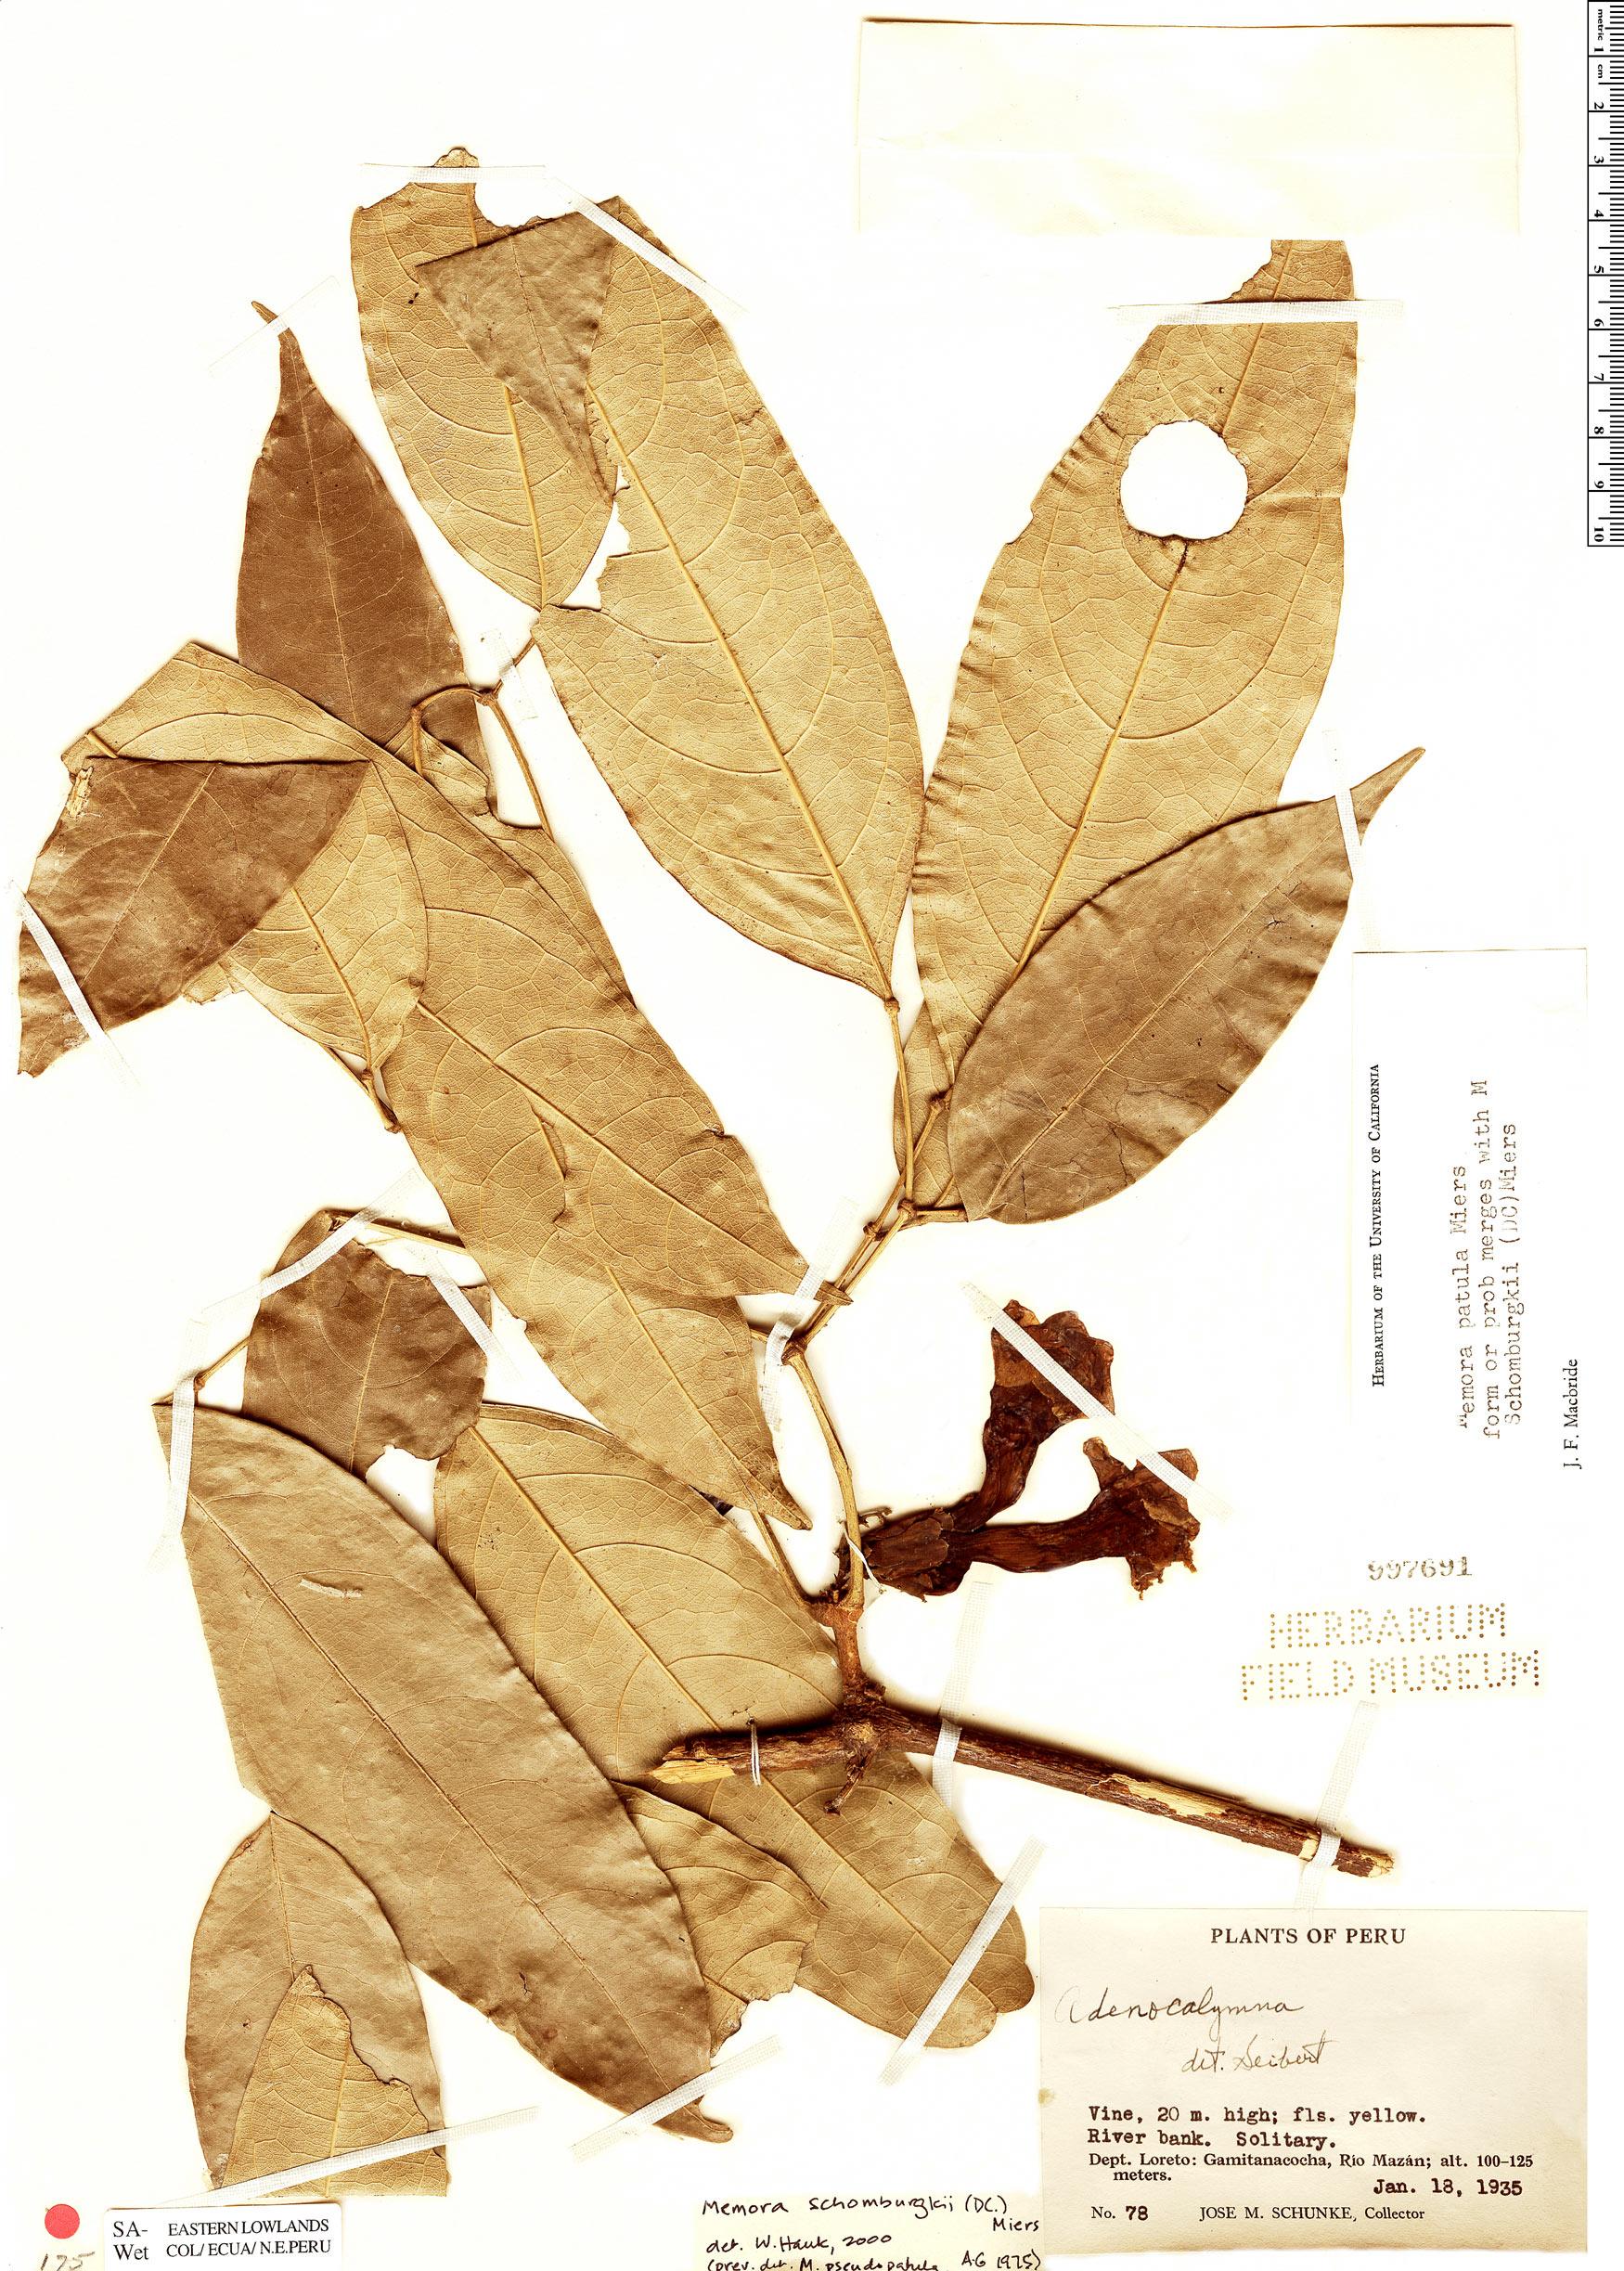 Specimen: Adenocalymma schomburgkii